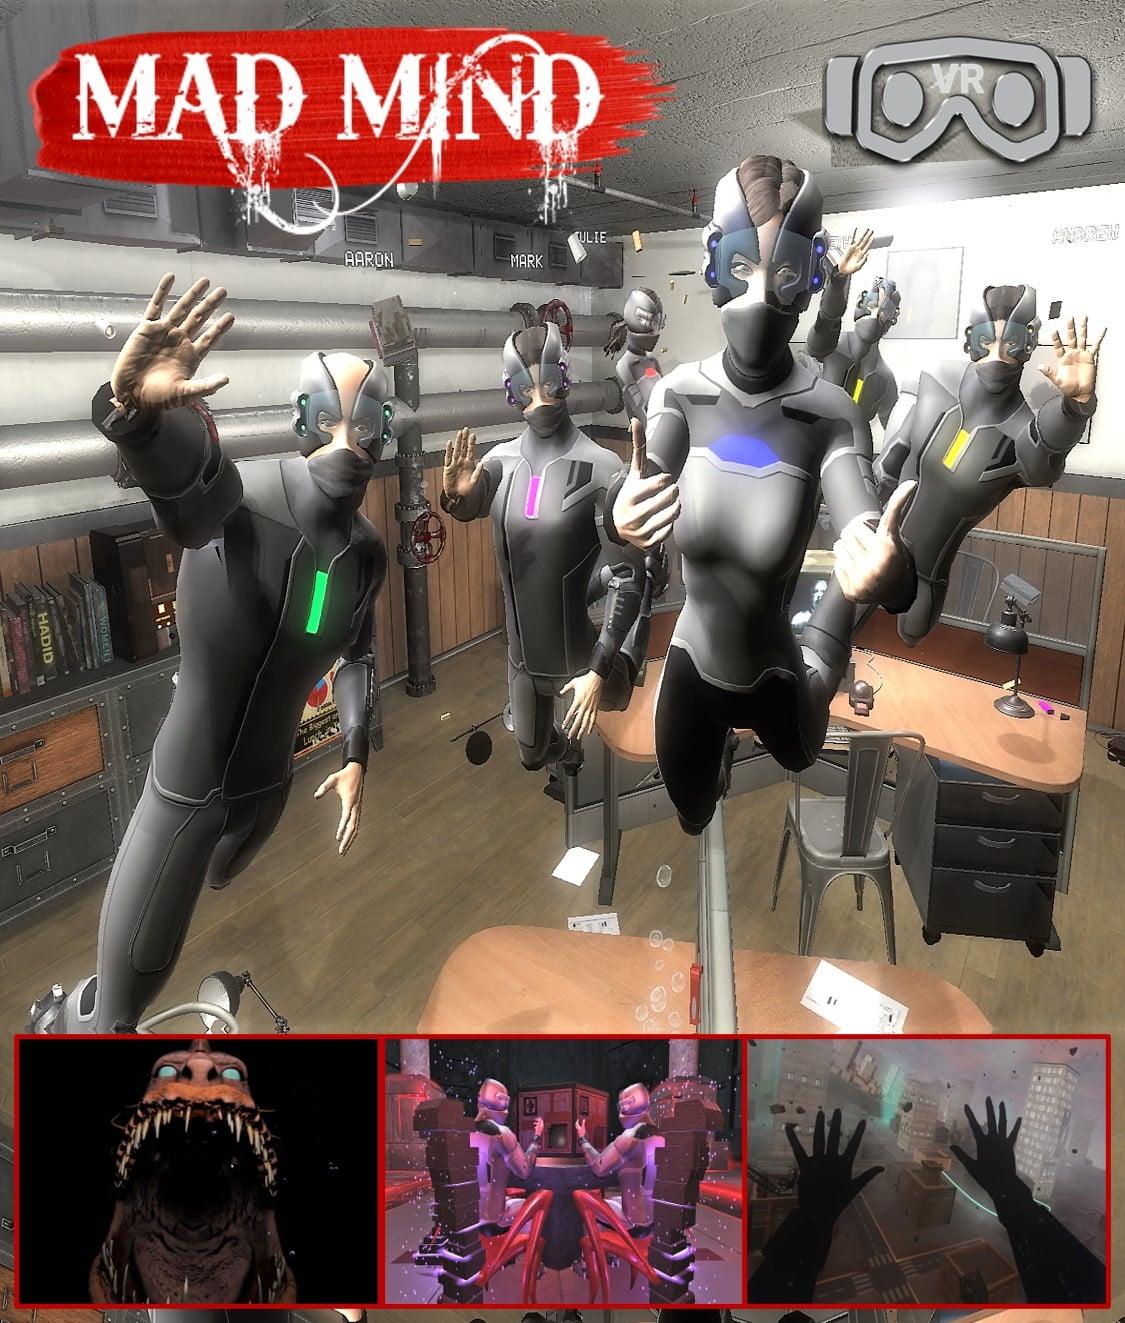 Mad Mind-Entermission Virtual Reality Escape Room-644x760-VR